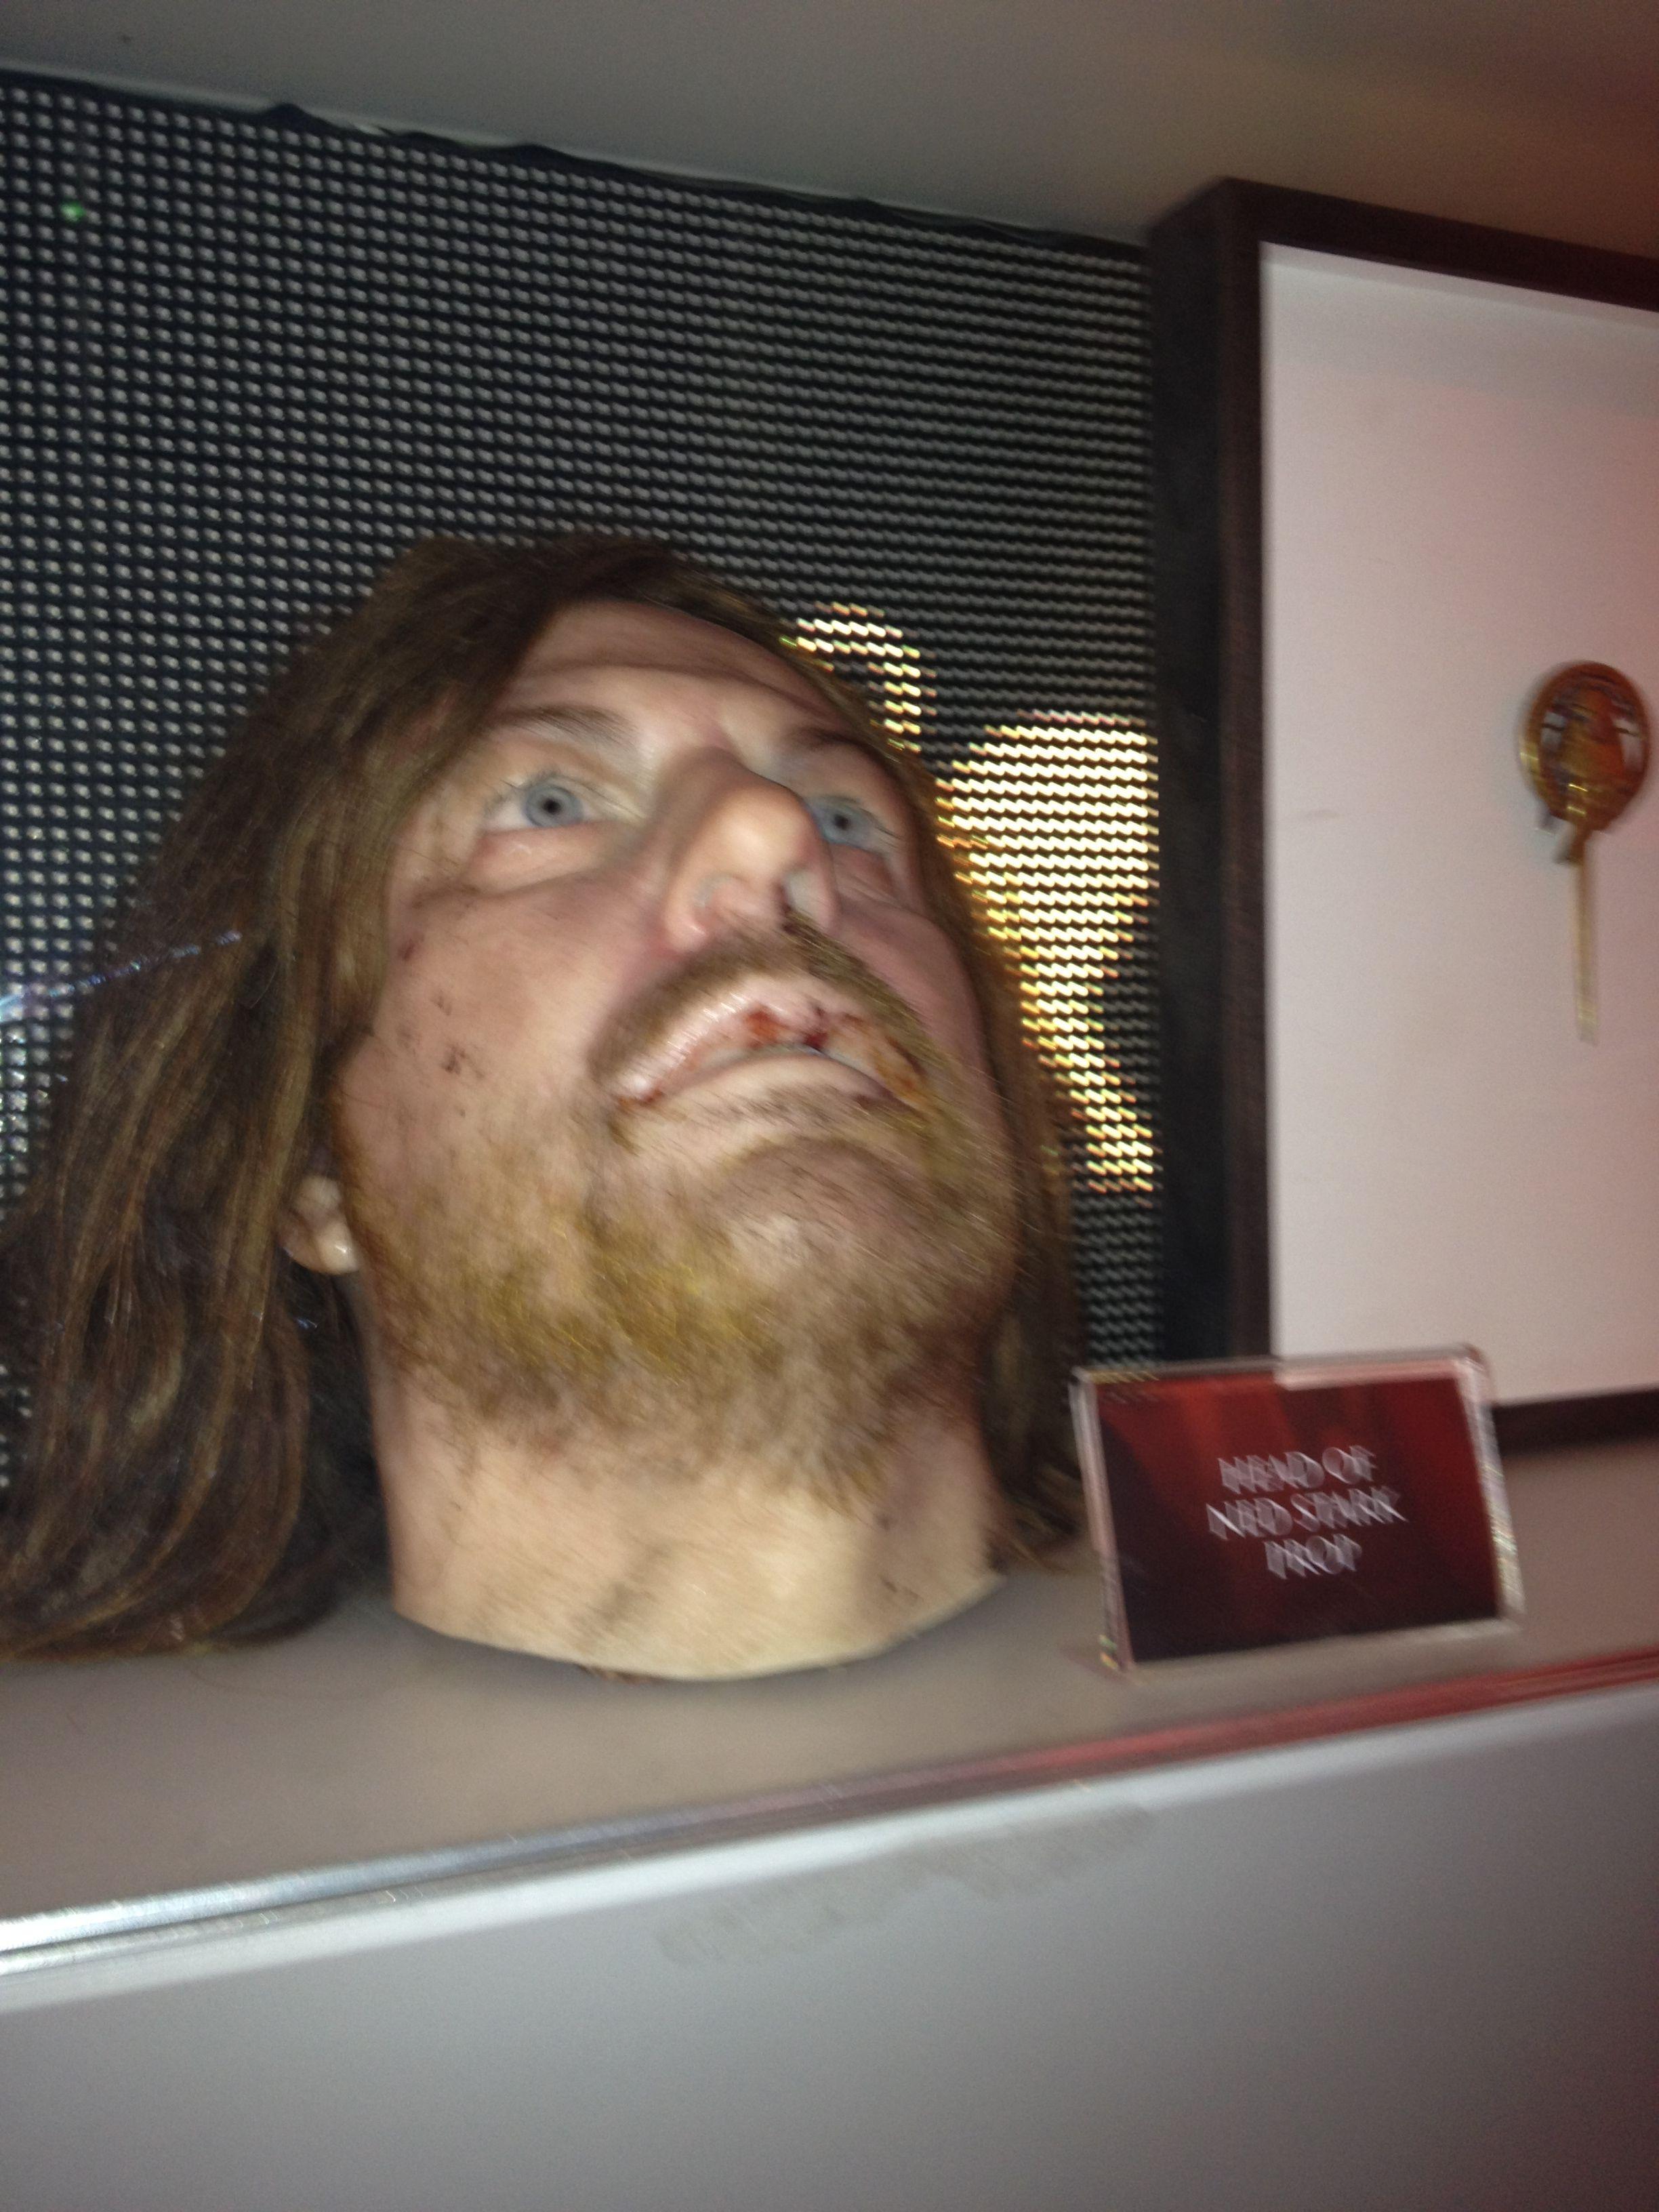 Ned Stark's Head